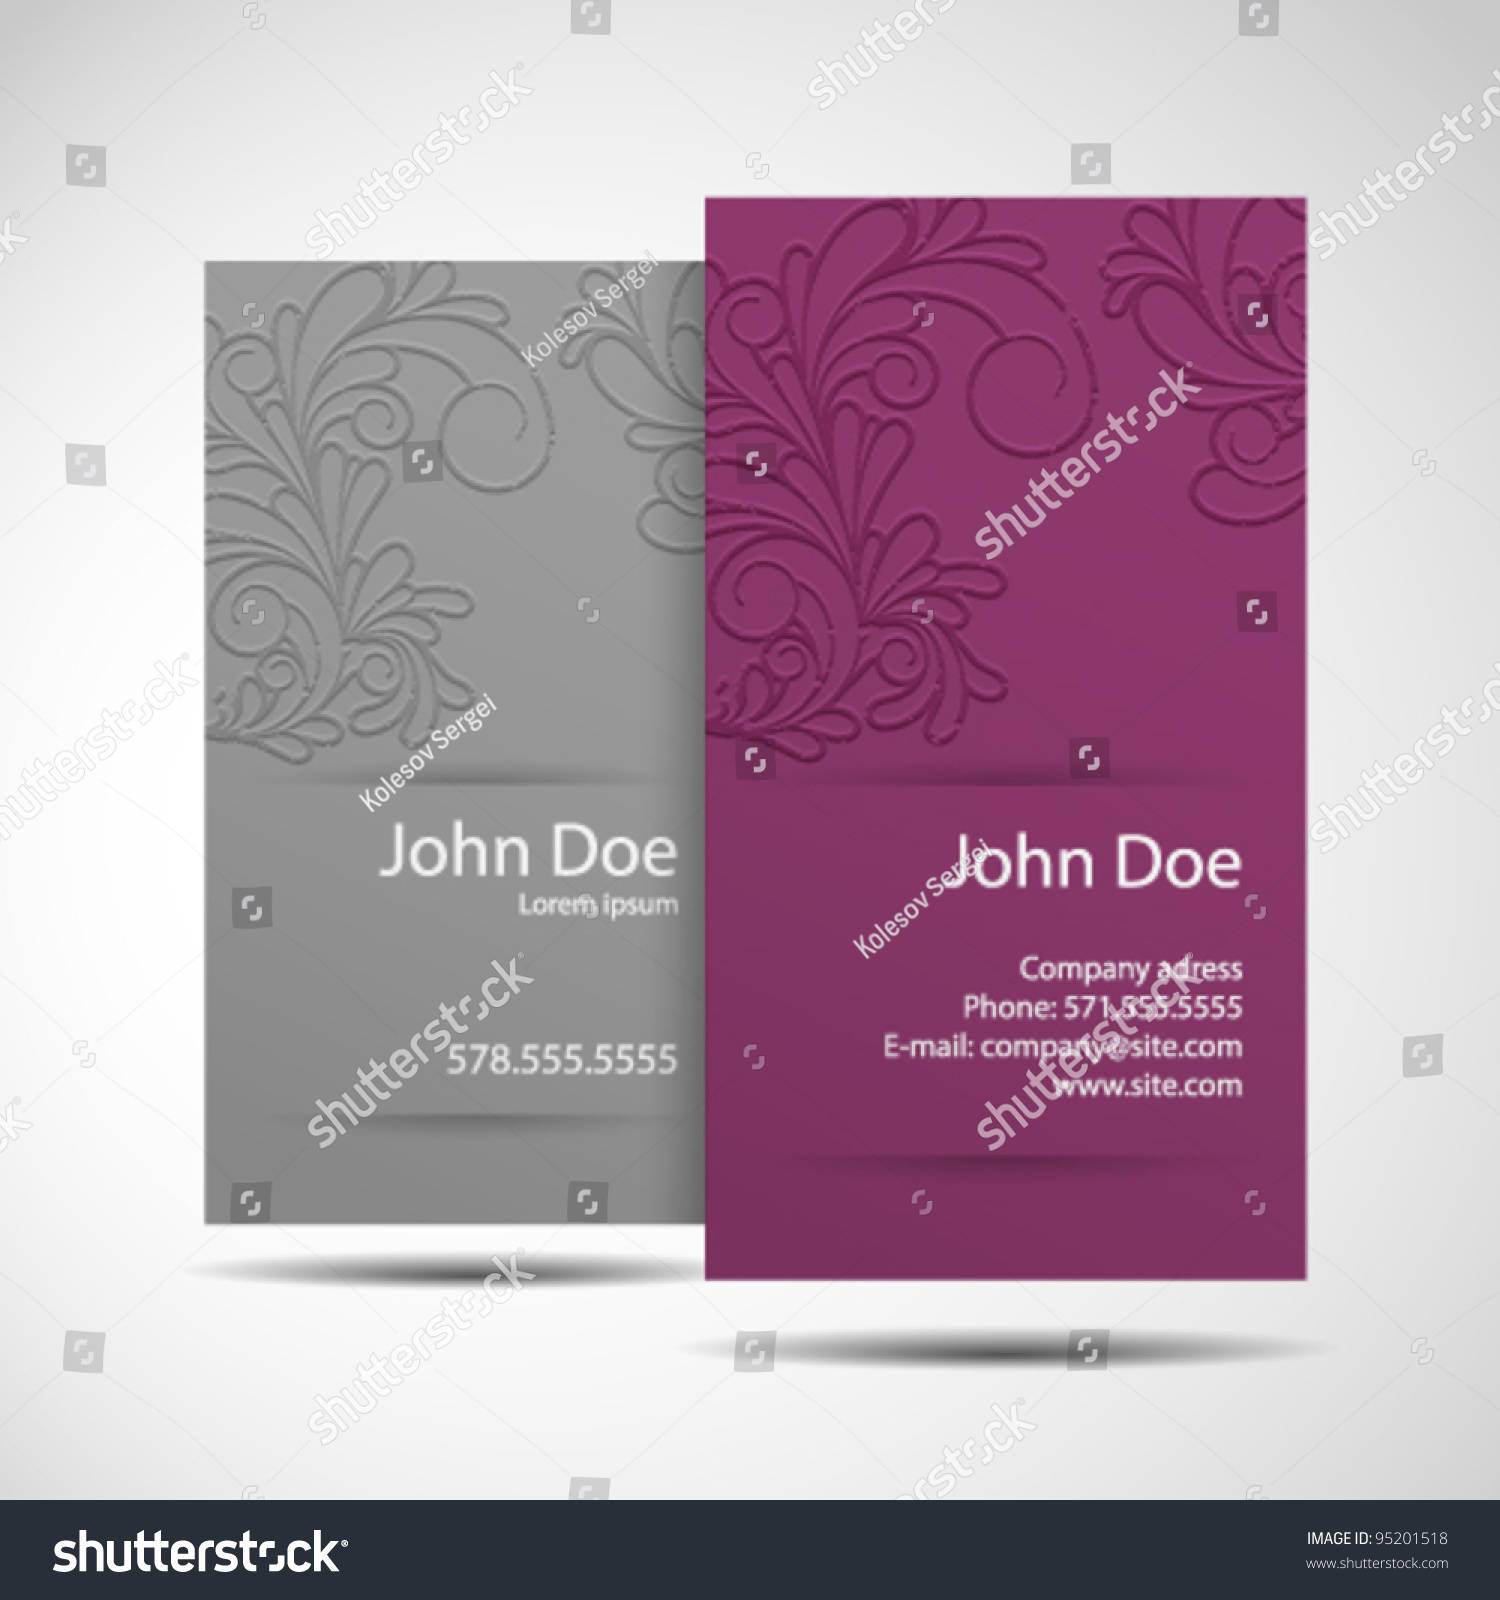 Business card monochrome stylish modern business stock vector business card monochrome stylish and modern business card magicingreecefo Images